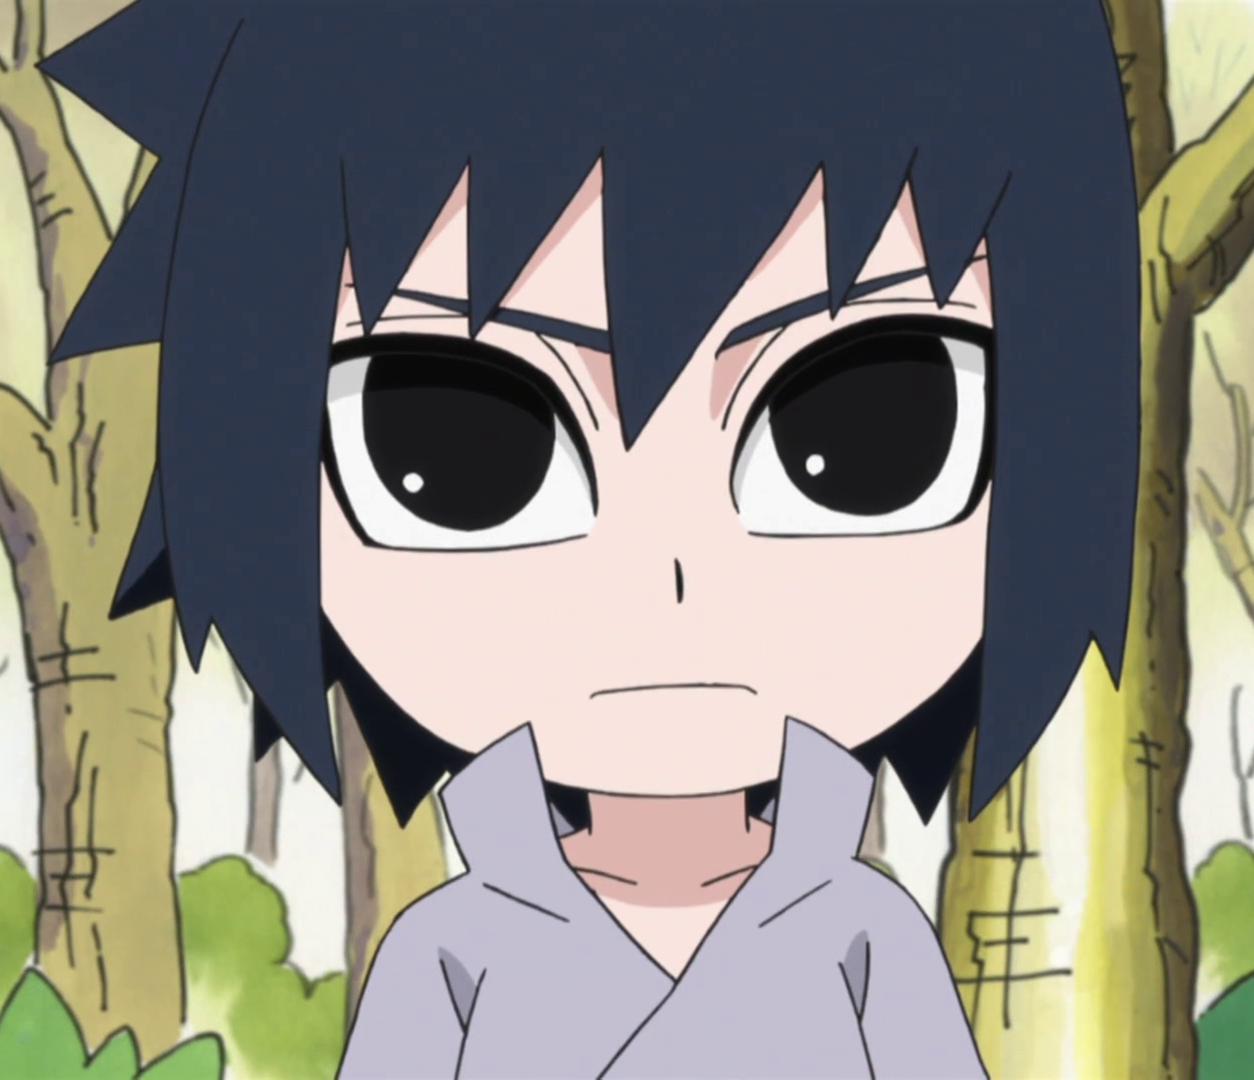 Sasuke Uchiha Sasuke Chibi Anime Chibi Anime Naruto